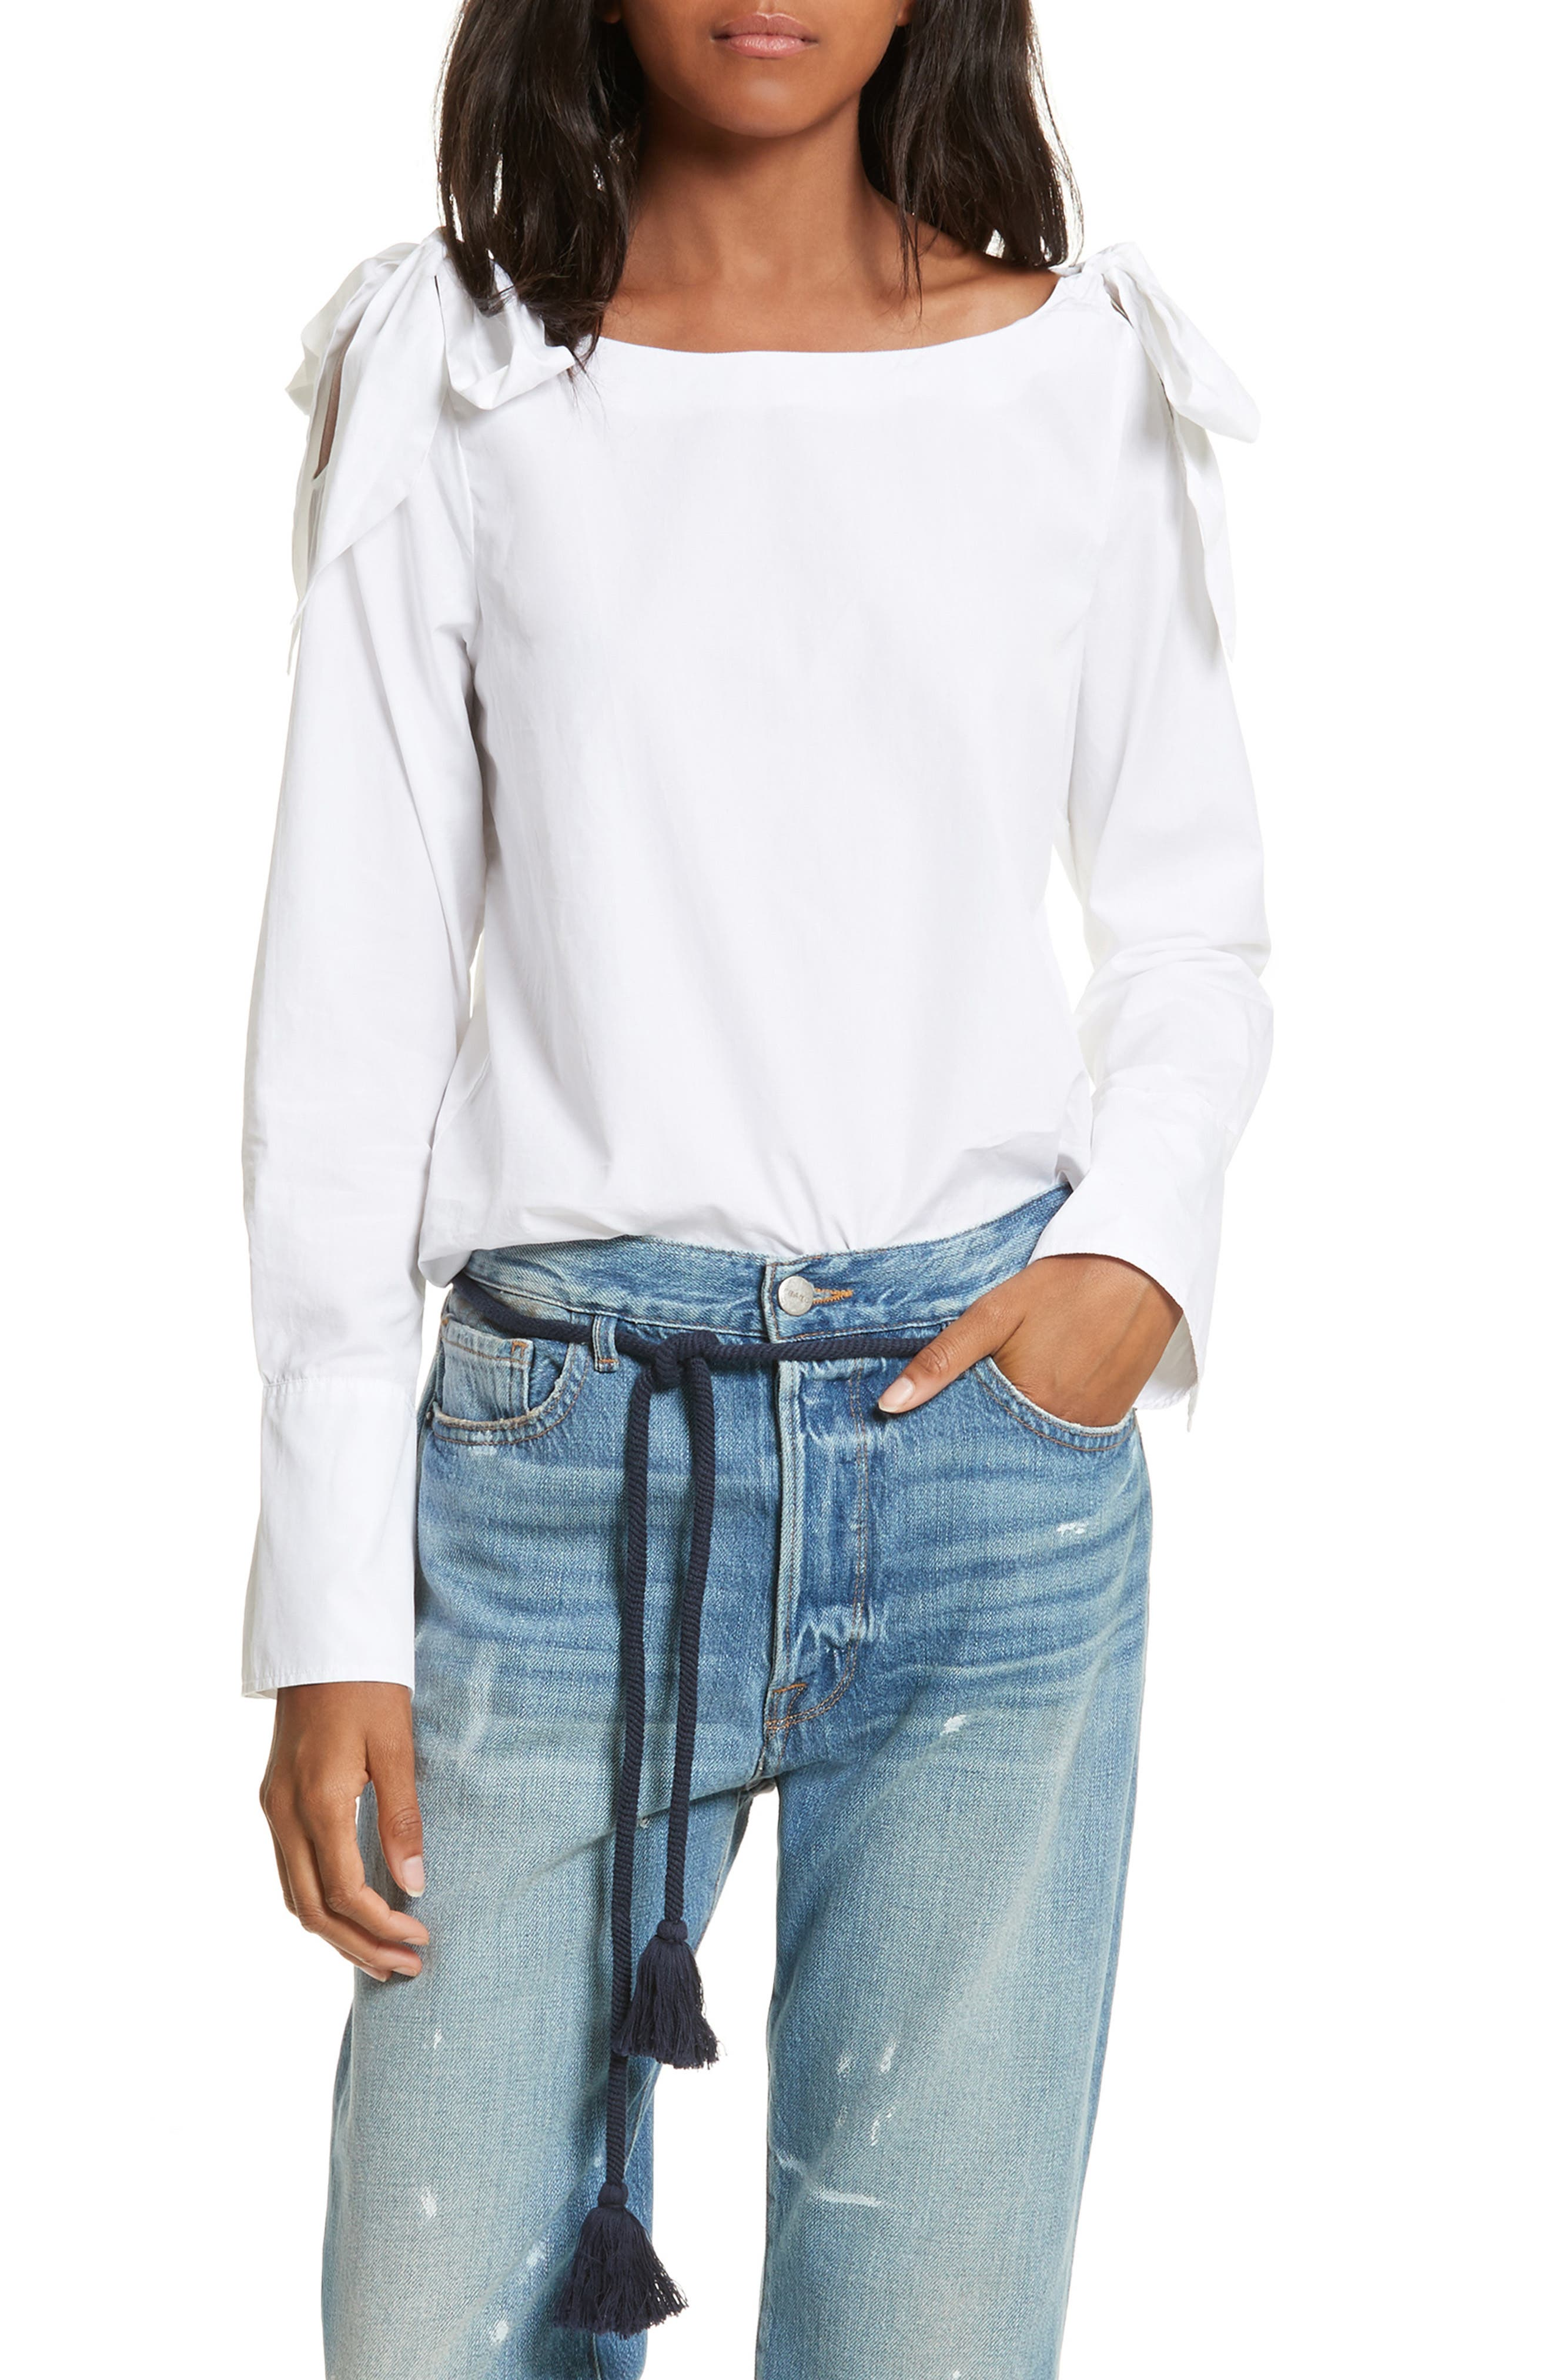 Alternate Image 1 Selected - FRAME Bow Cold Shoulder Cotton Blouse